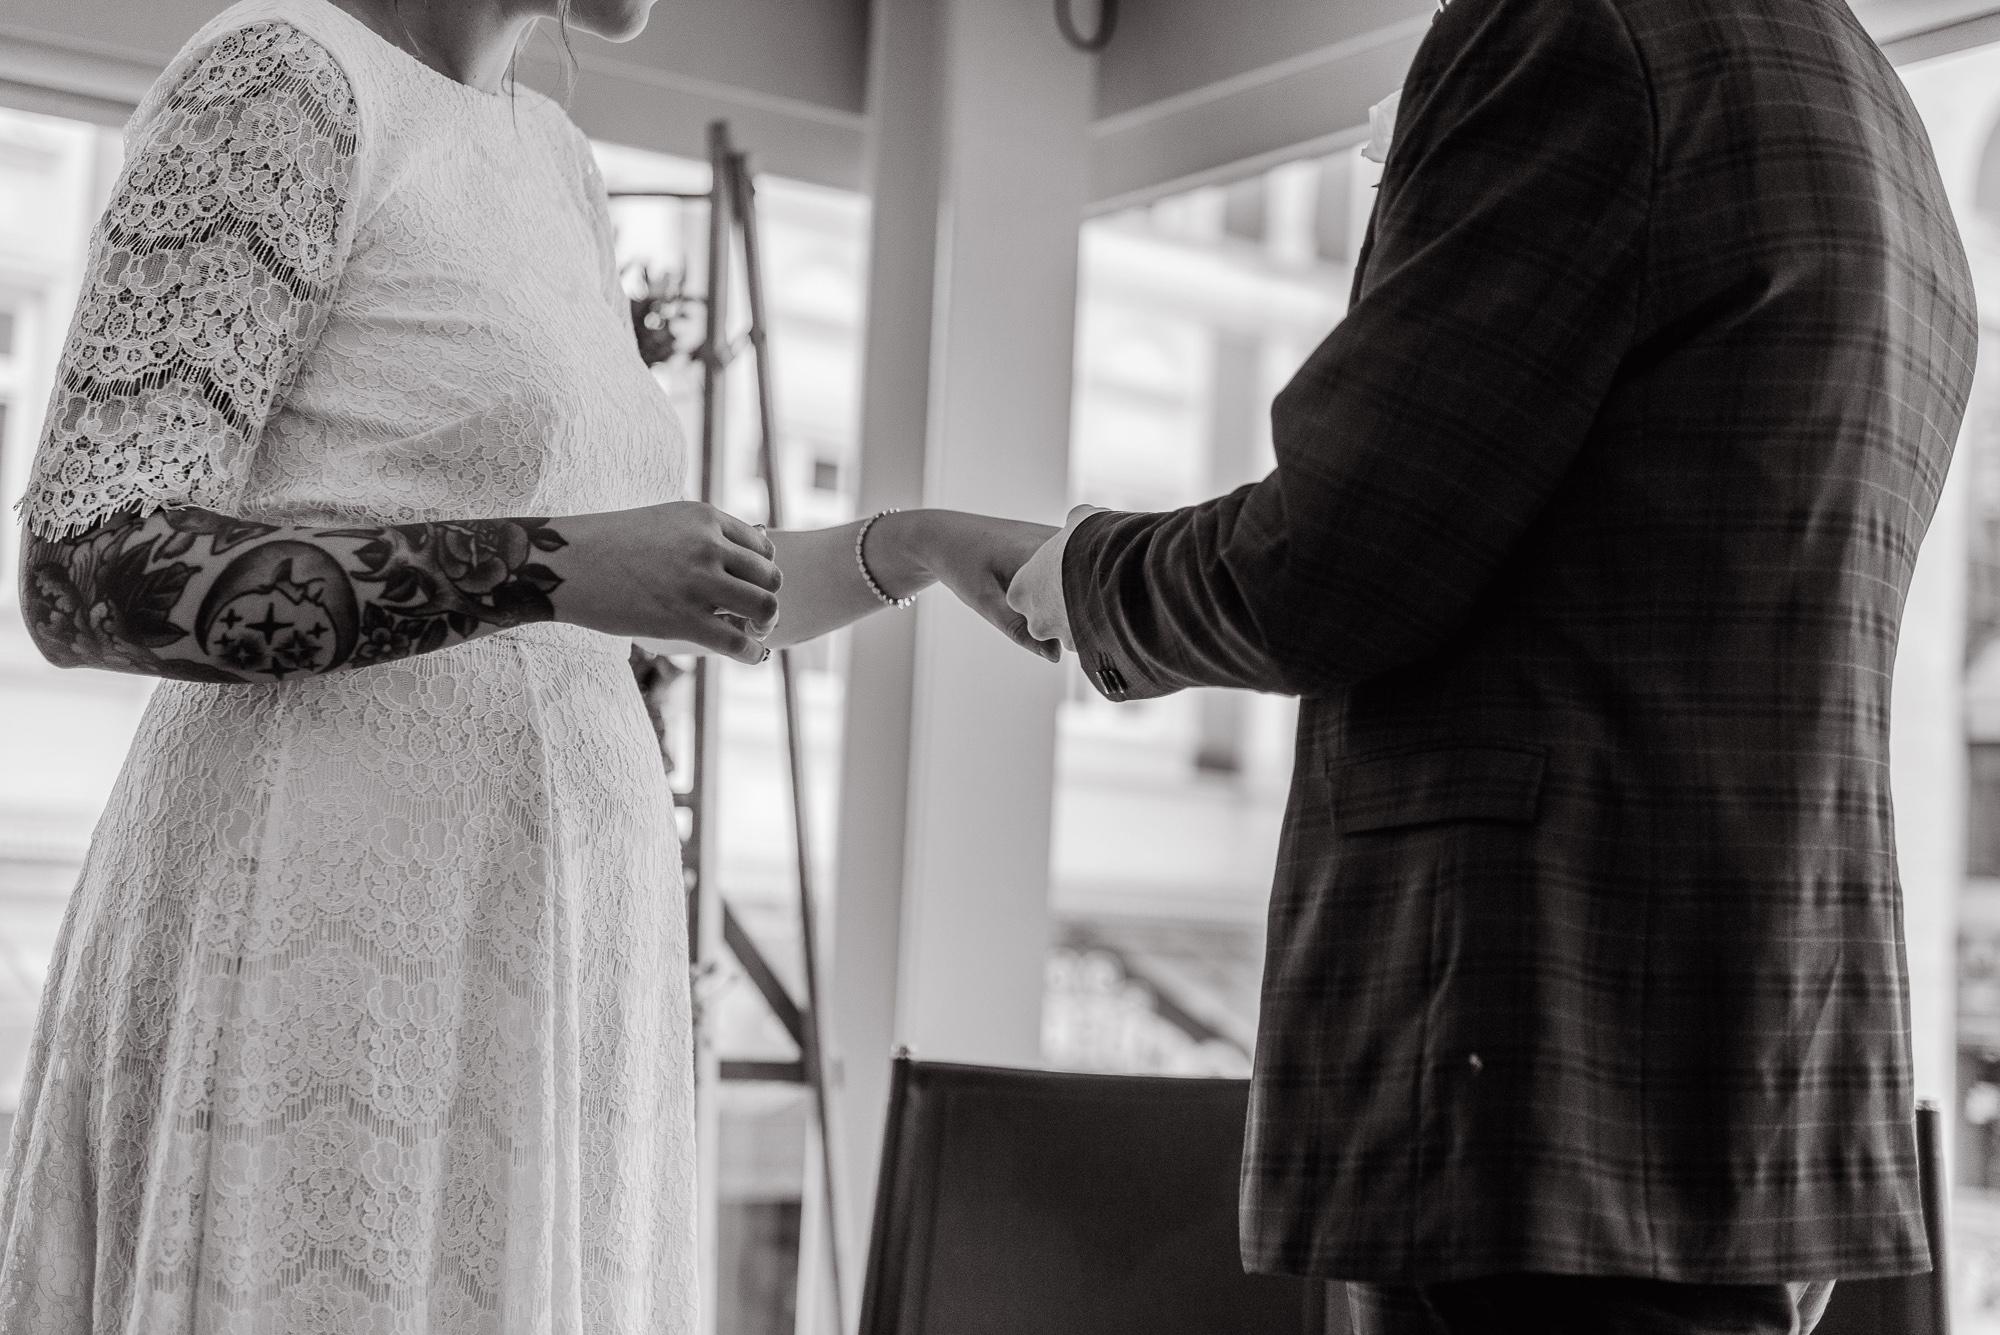 Harriet-Dahlia-Bespoke-Lace-Silk-Bohemian-Wedding-Dress-Sleeves-Tattooed-Bride-Alternative-Wedding-Sheffield-11.jpg